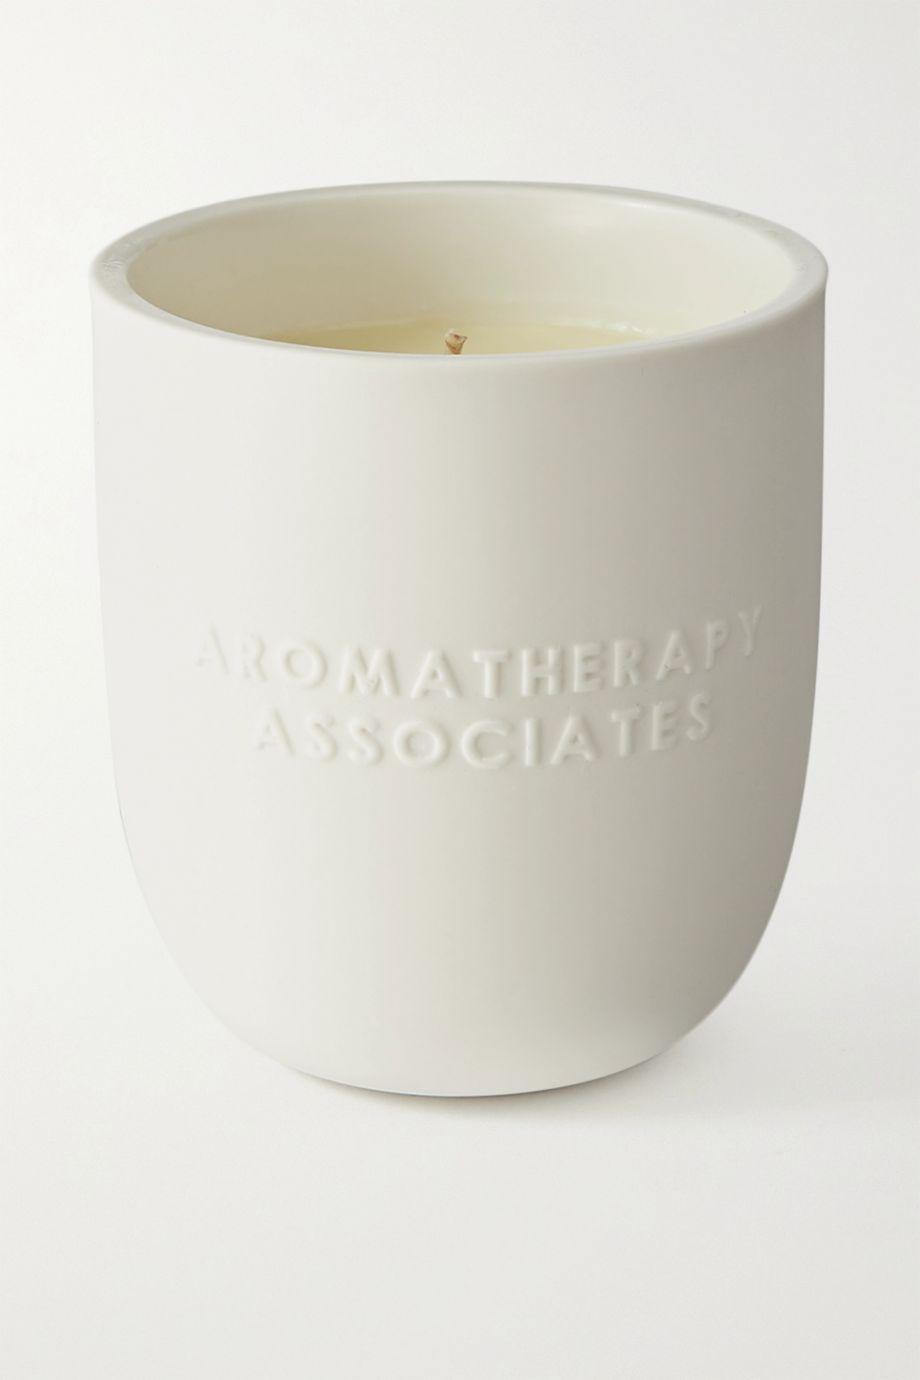 Aromatherapy Associates Rose Candle, 200g